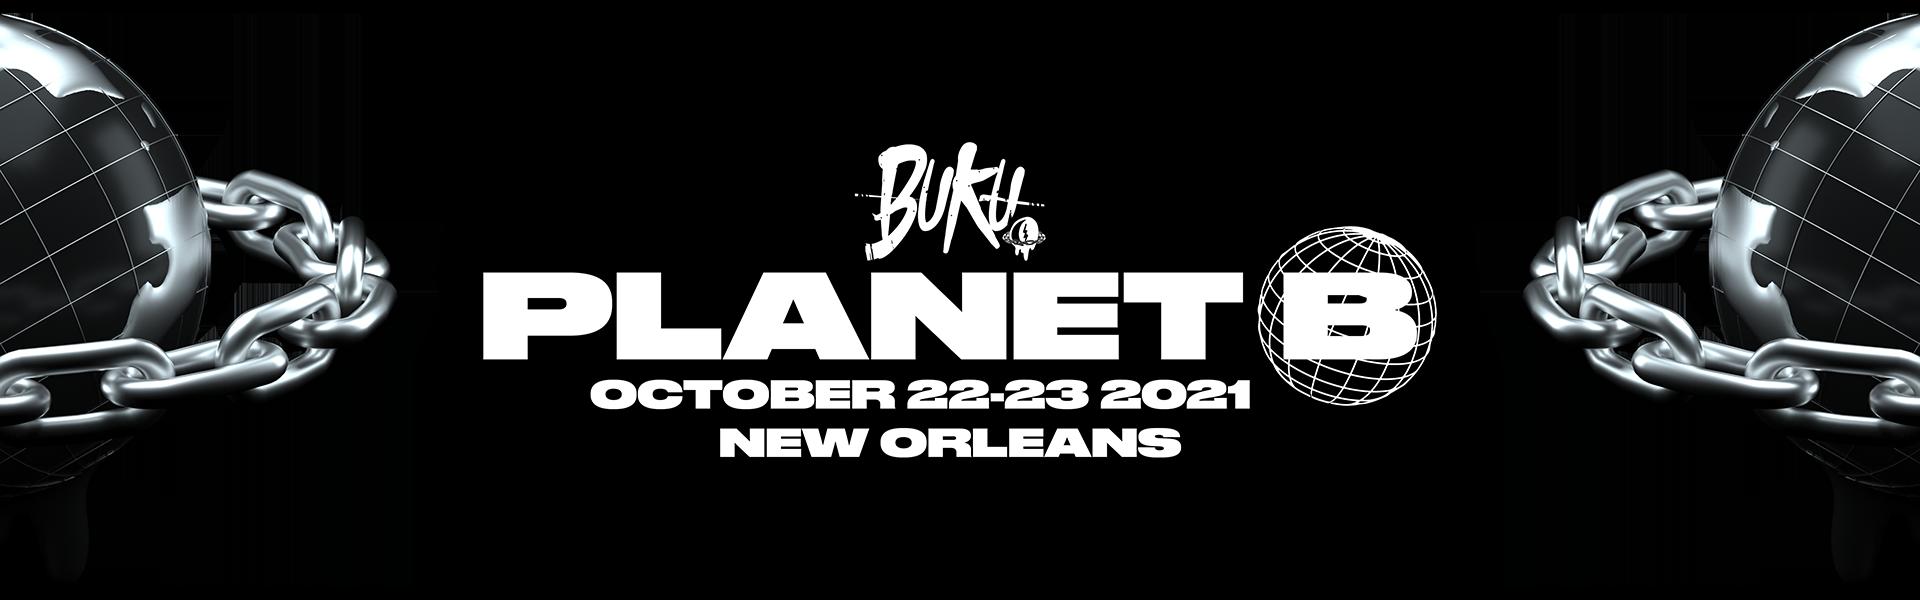 Buku Planet B | October 22-23, 2021